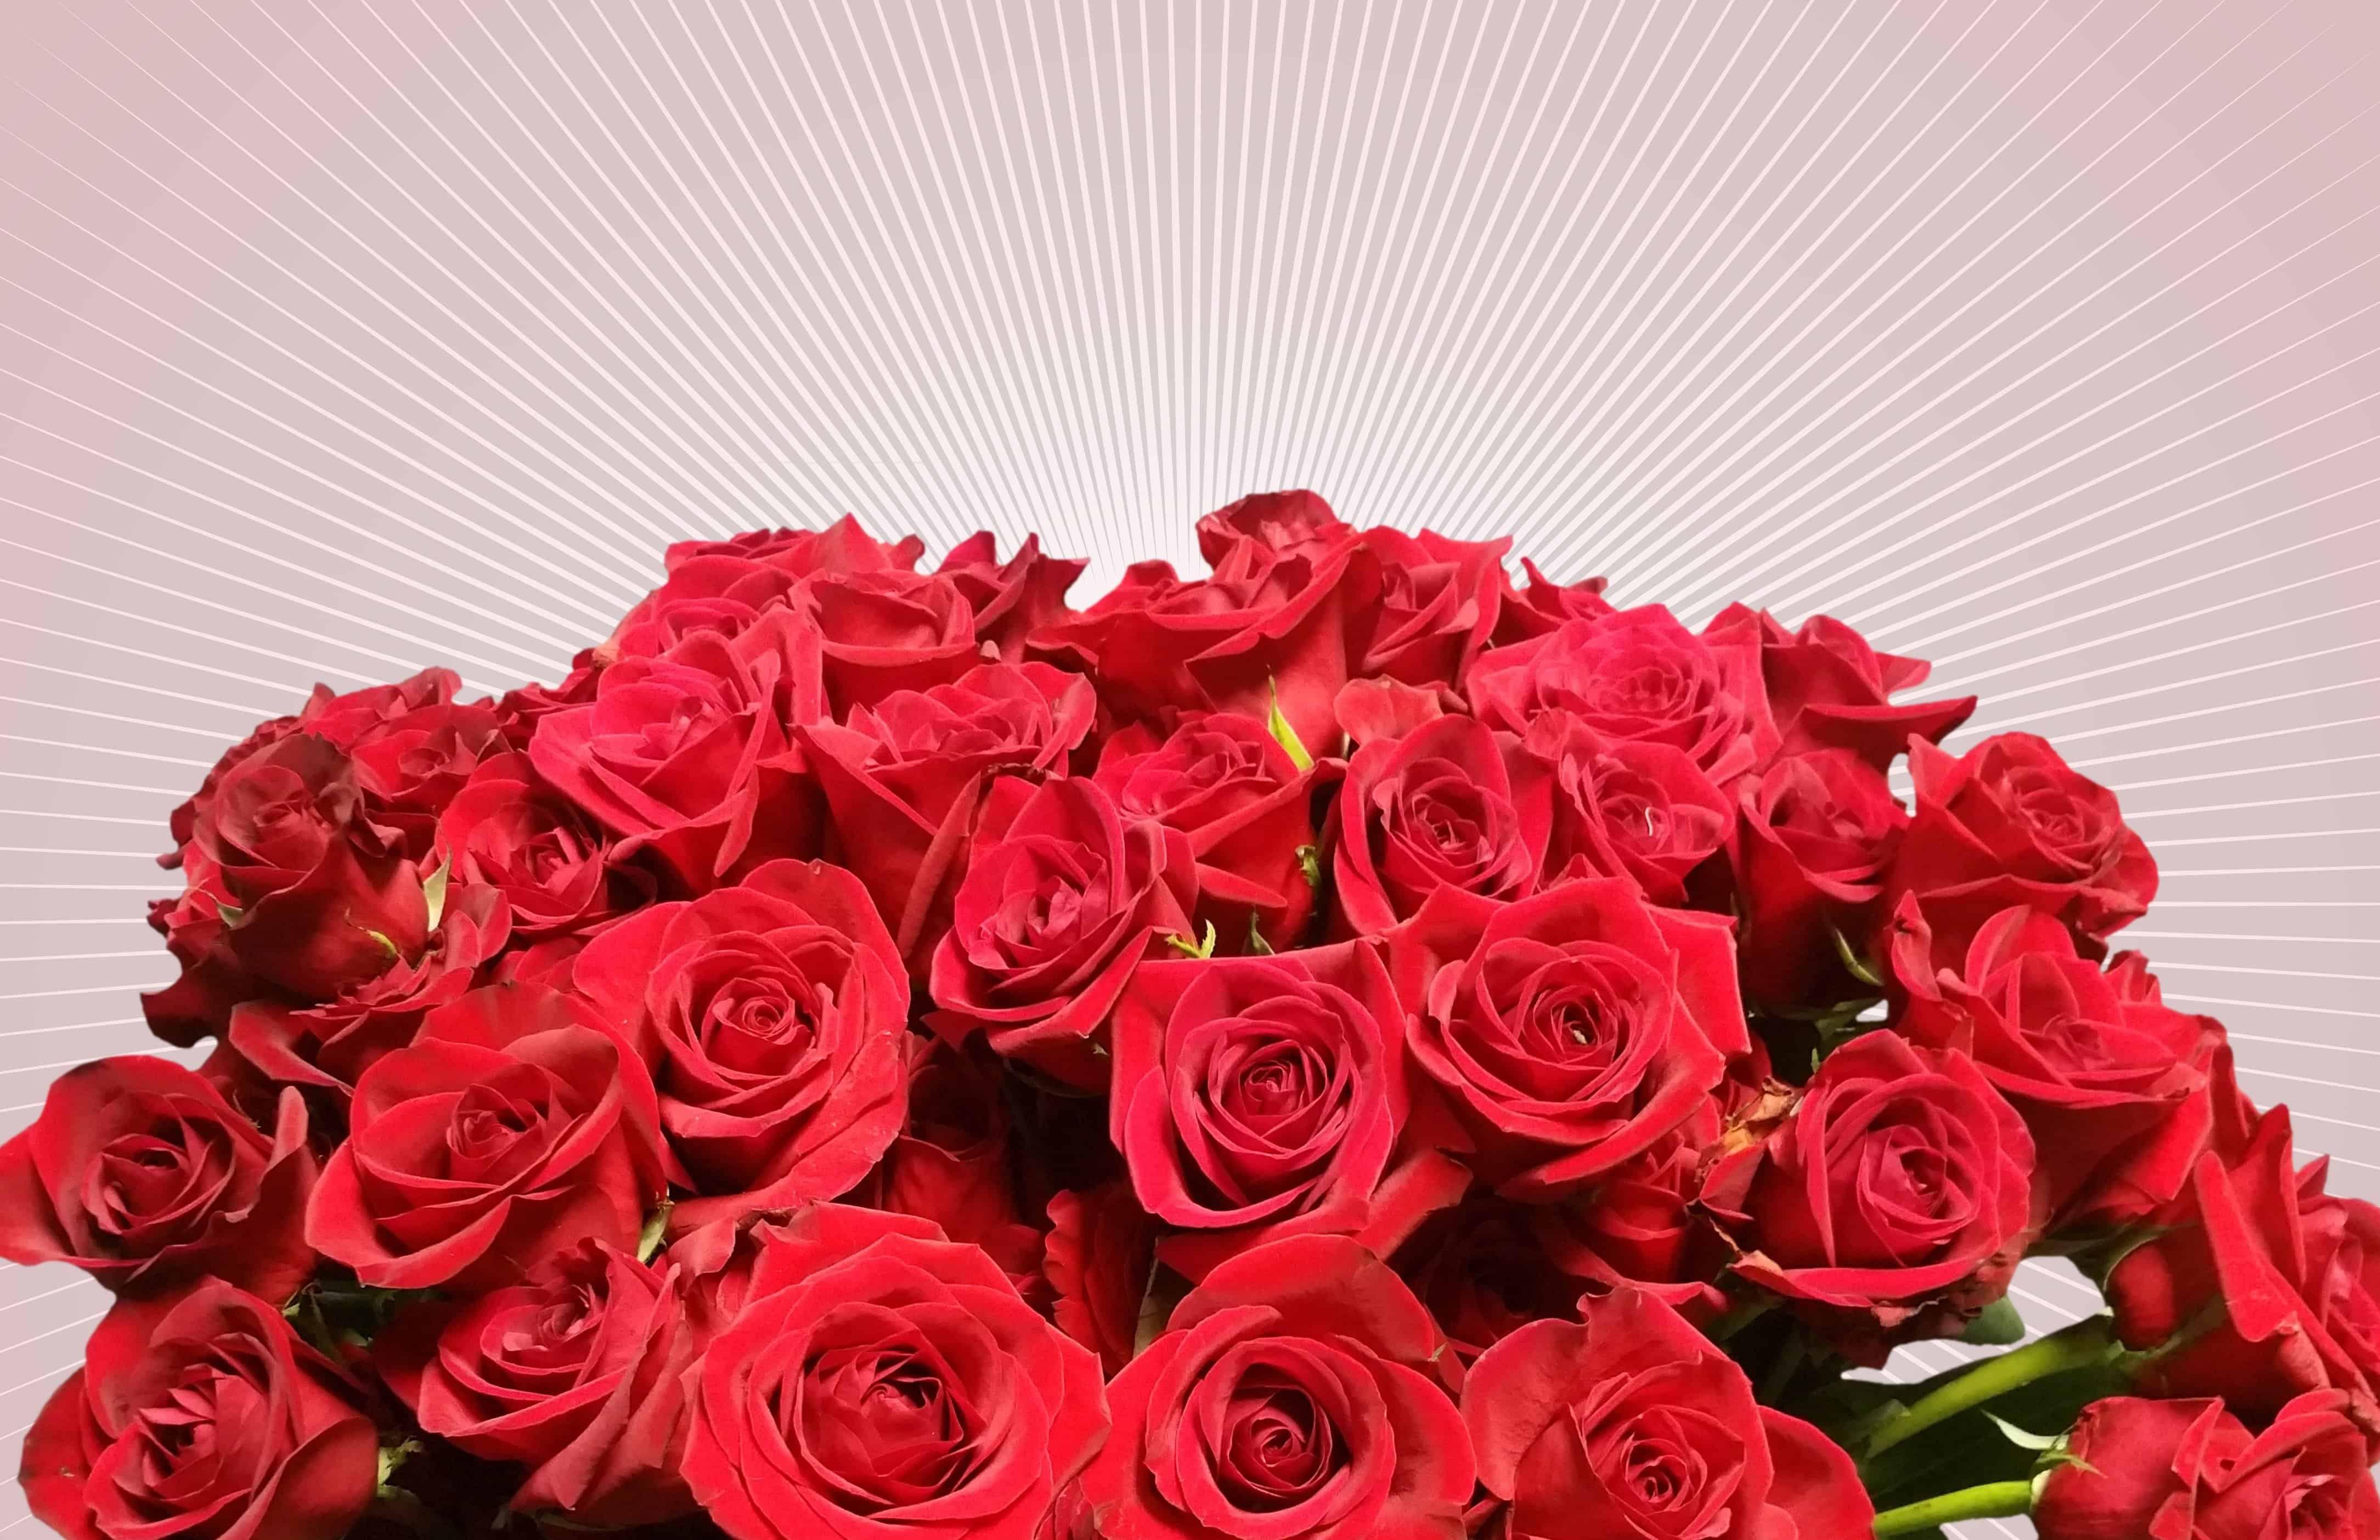 Free picture: bouquet, red flower, petal, rose, petals, blossom ...